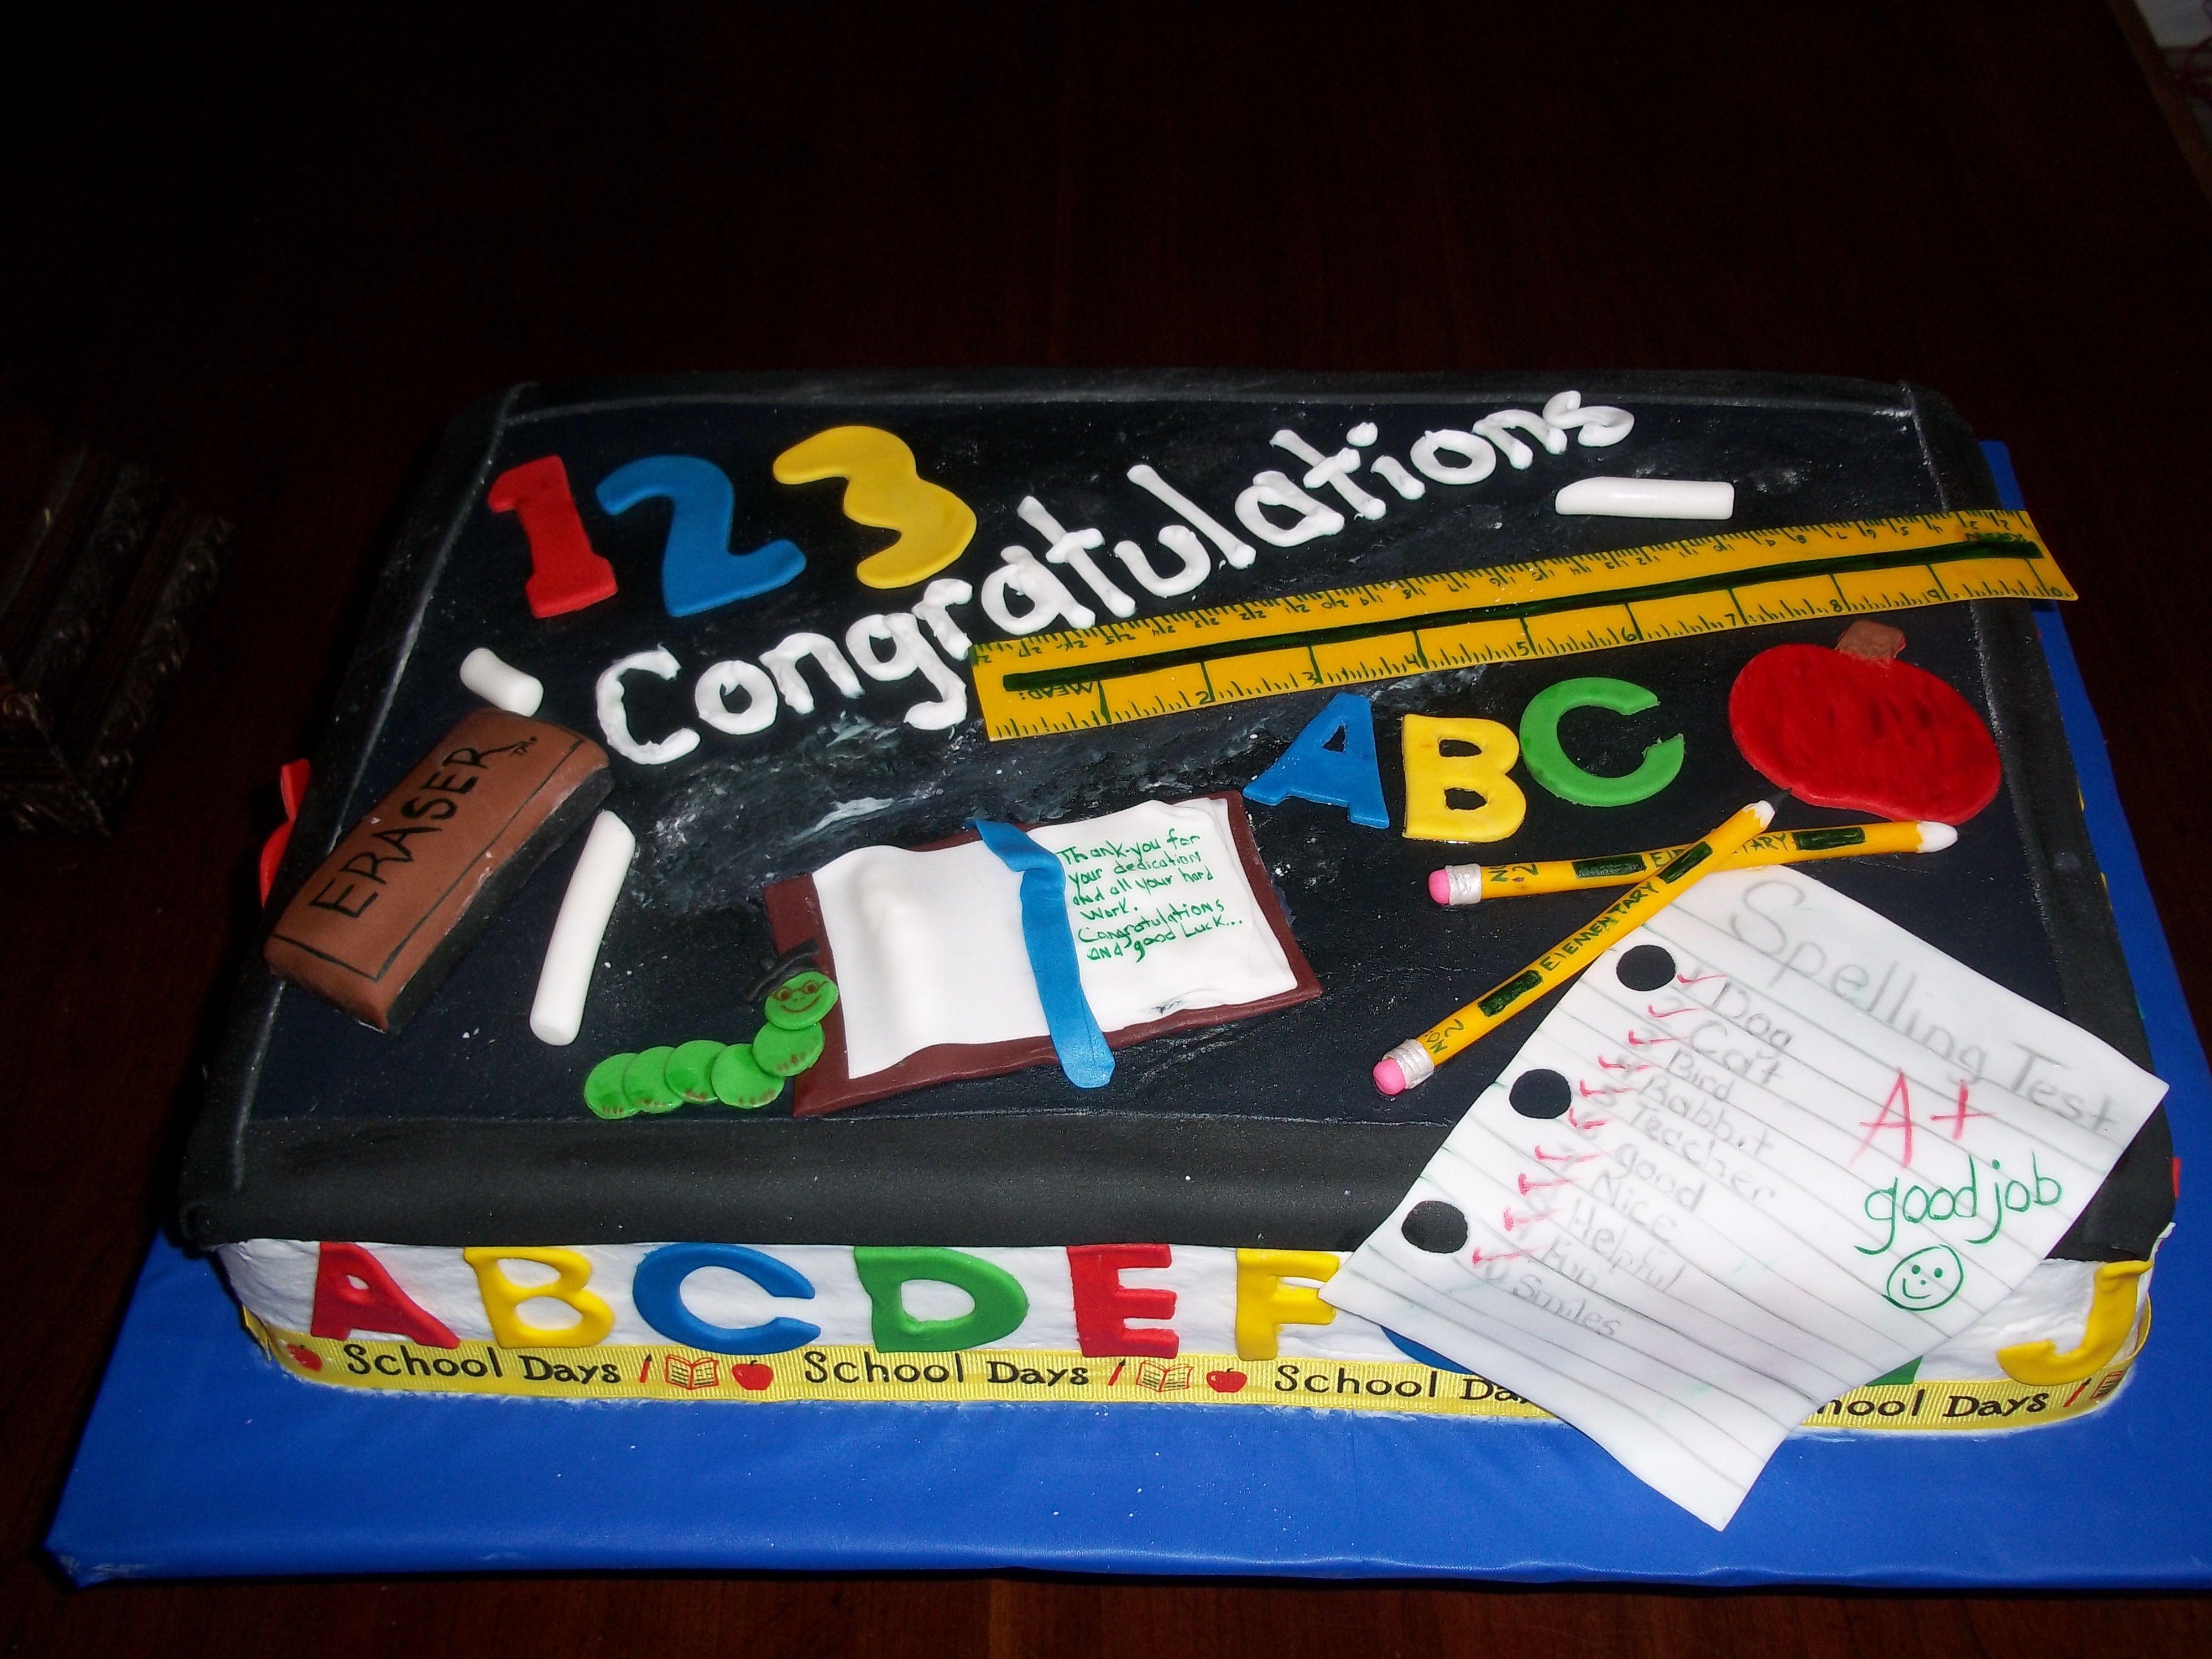 Pin Teacher Retirement Cake Cookiecupcake Ideas Cake on ...